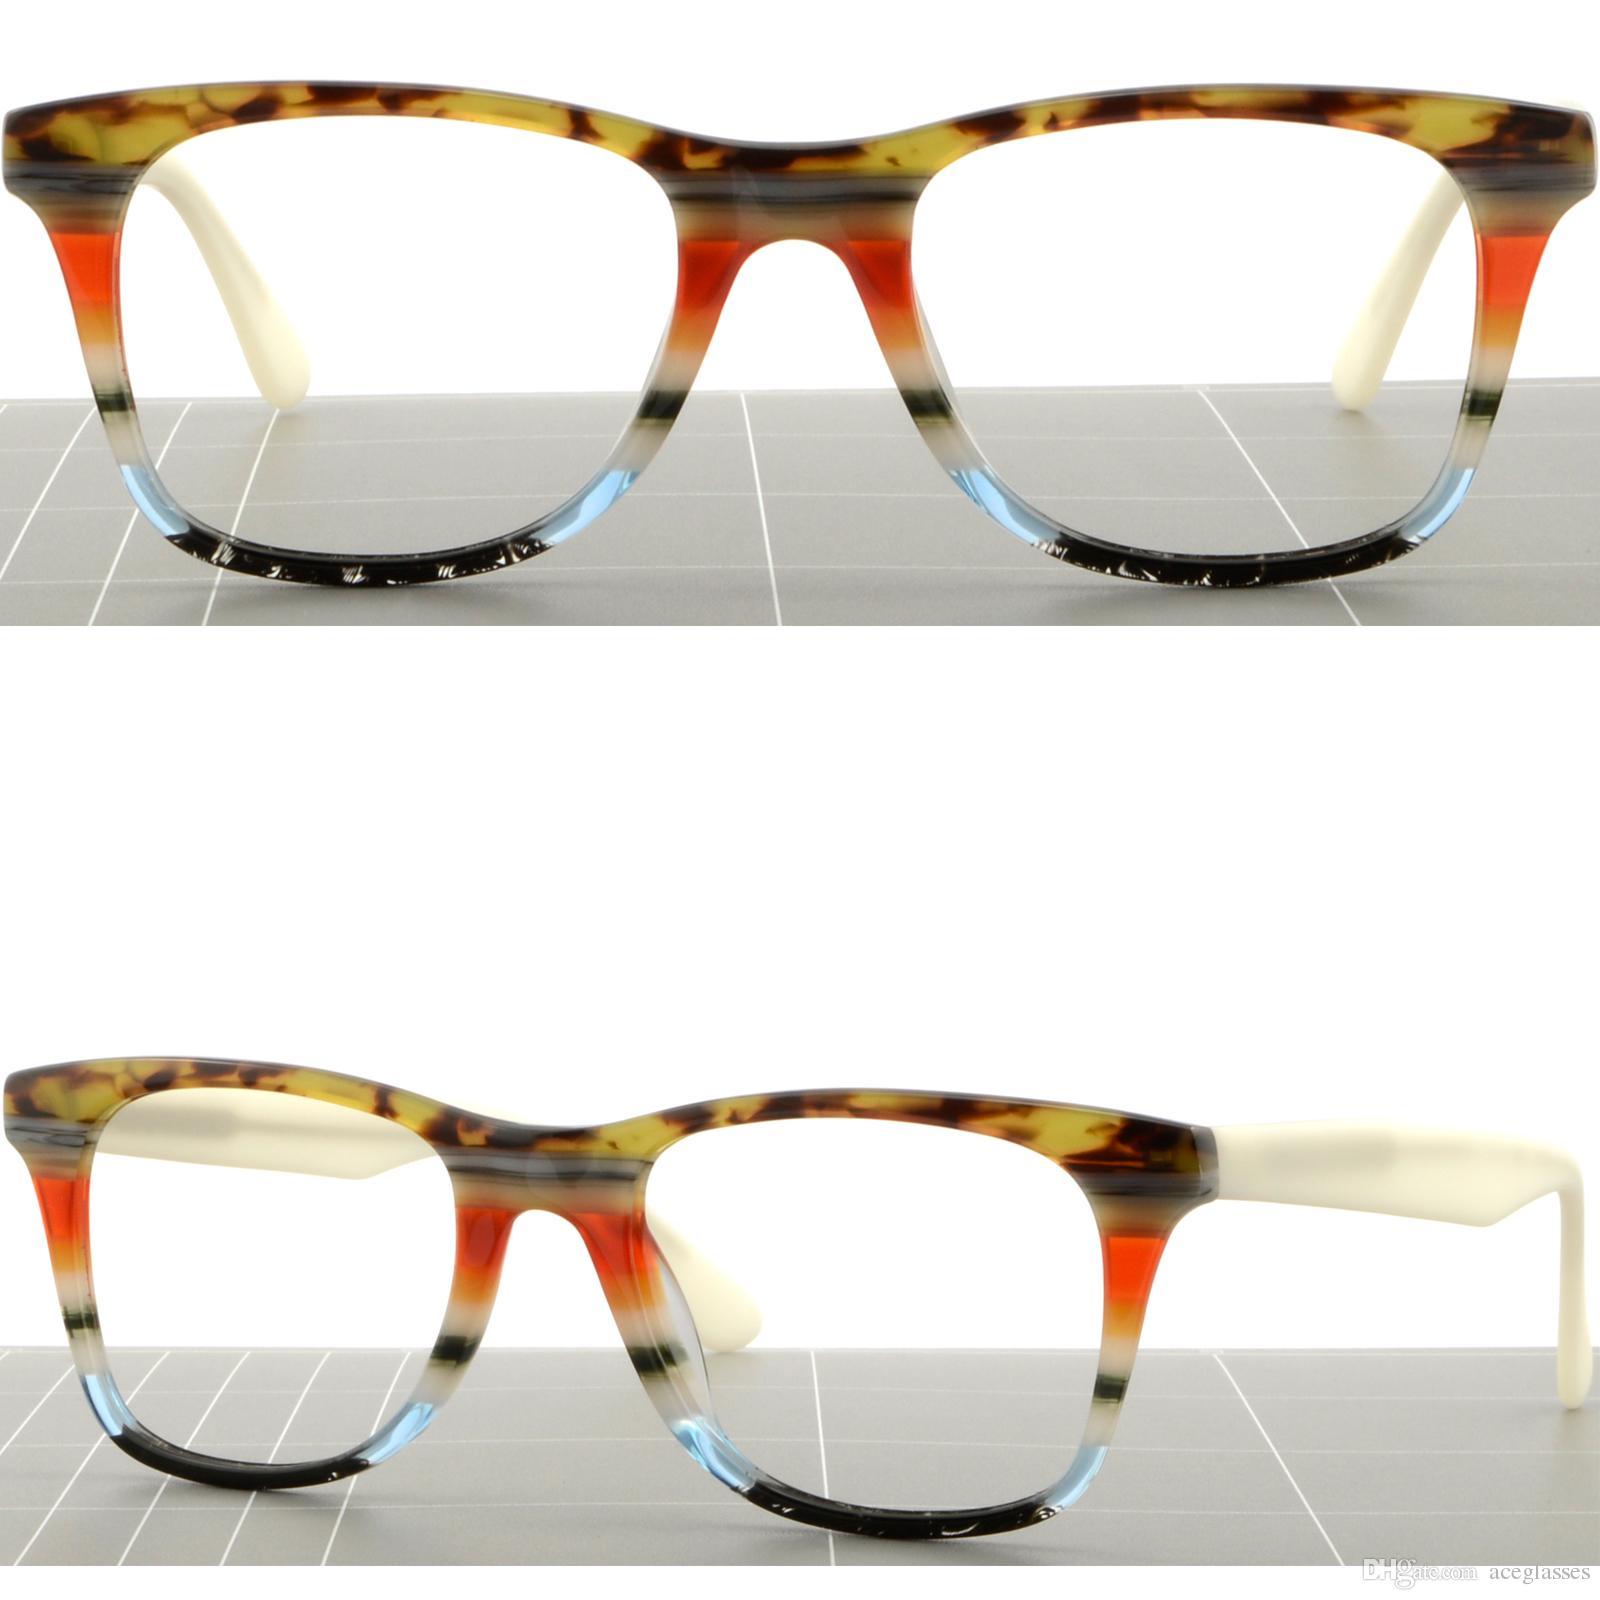 ad5db6efe4 Large Square Mens Womens Plastic Frames Light Prescription Glasses RX Sunglasses  Glasses Frame Online with  31.08 Piece on Aceglasses s Store